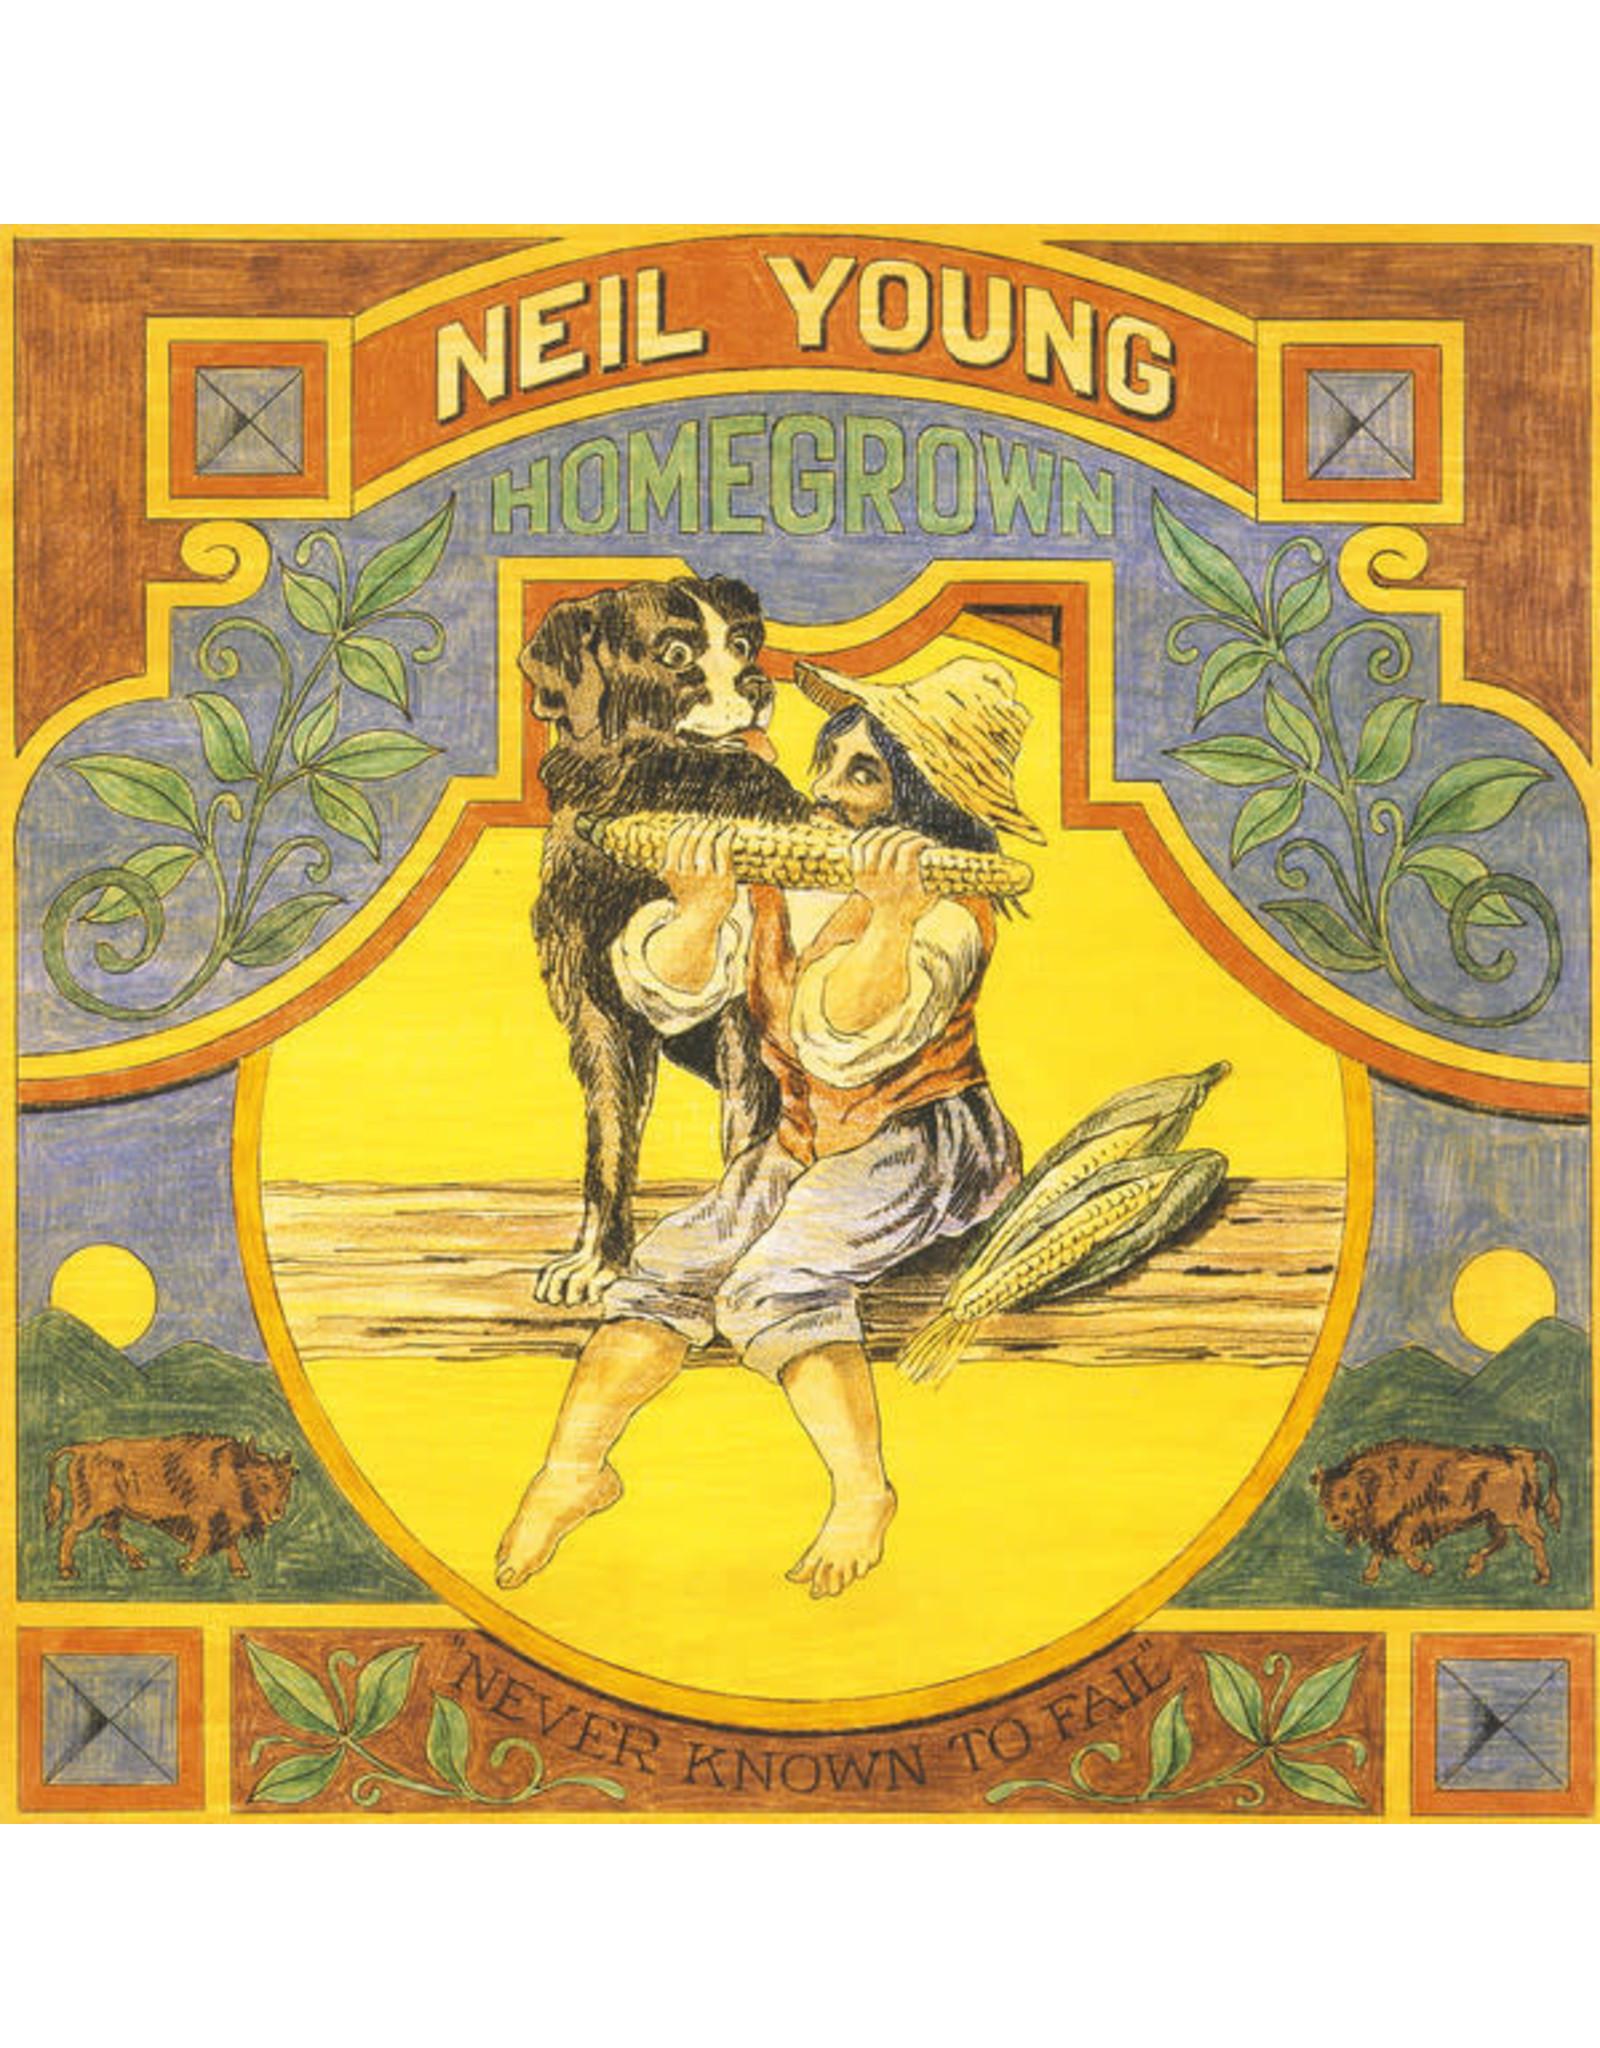 Young, Neil - Homegrown LP